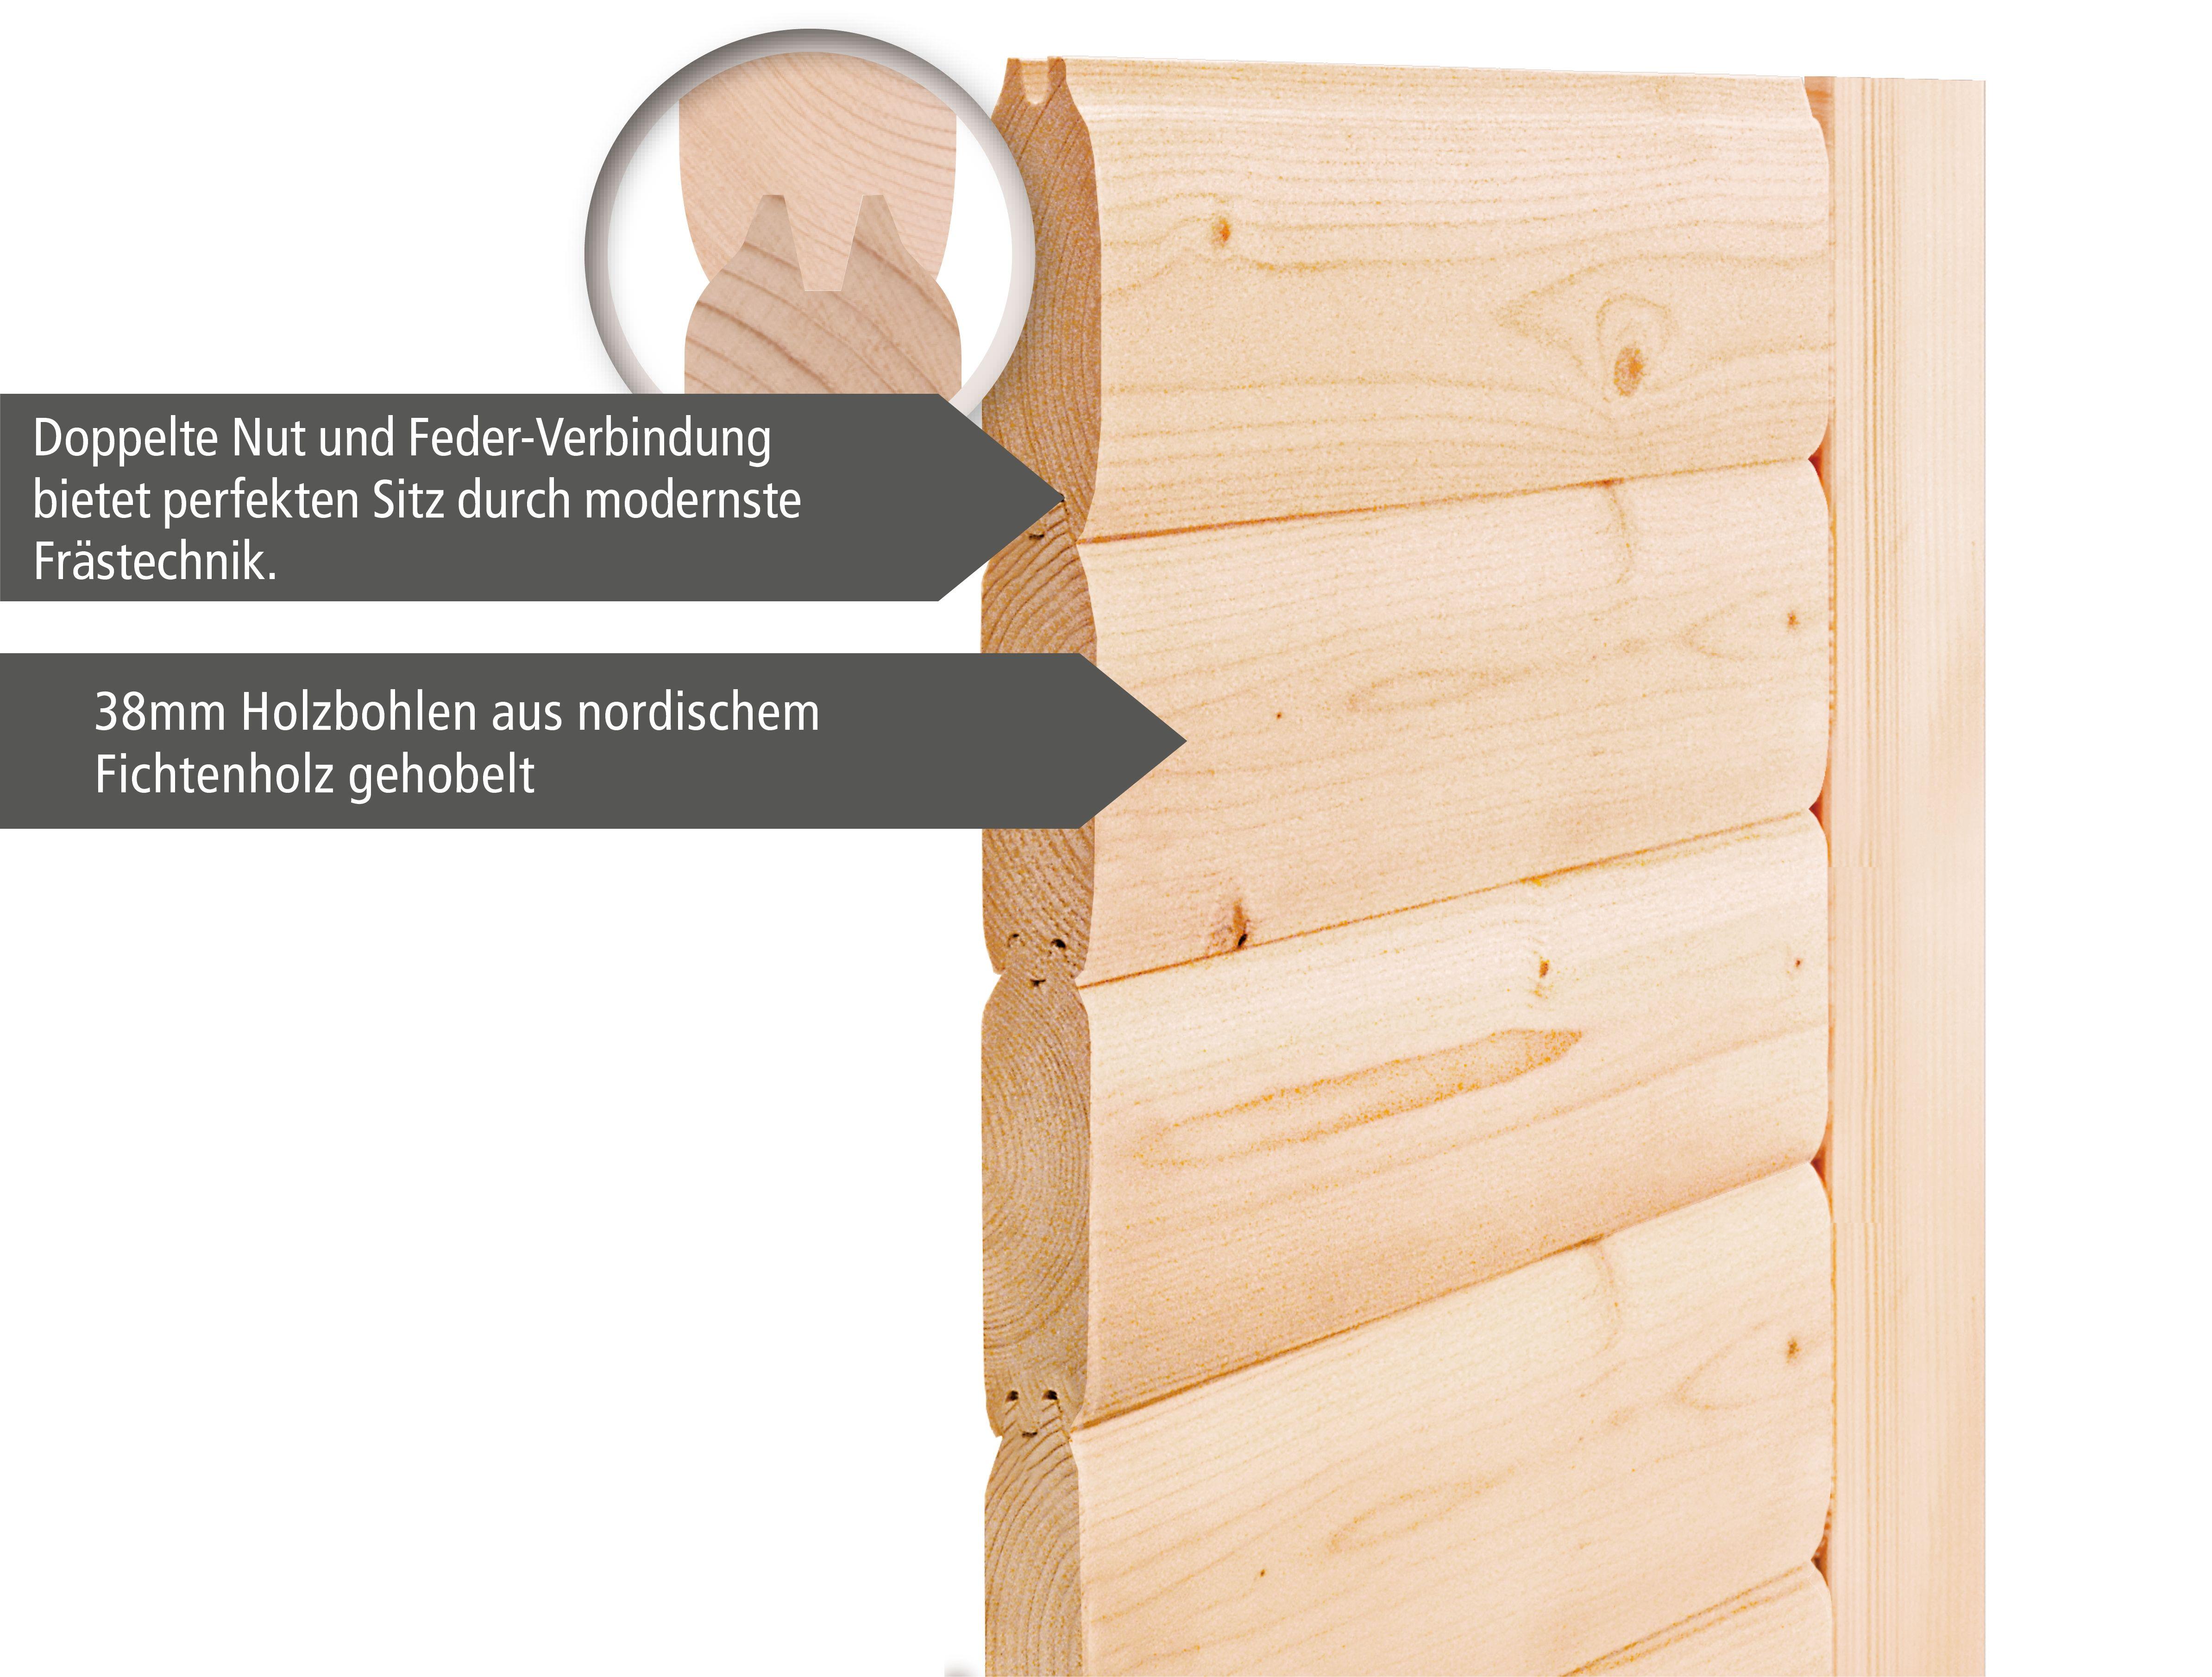 Woodfeeling Sauna Selena 38mm Dachkranz 230V Saunaofen 3,6 kW extern Bild 2